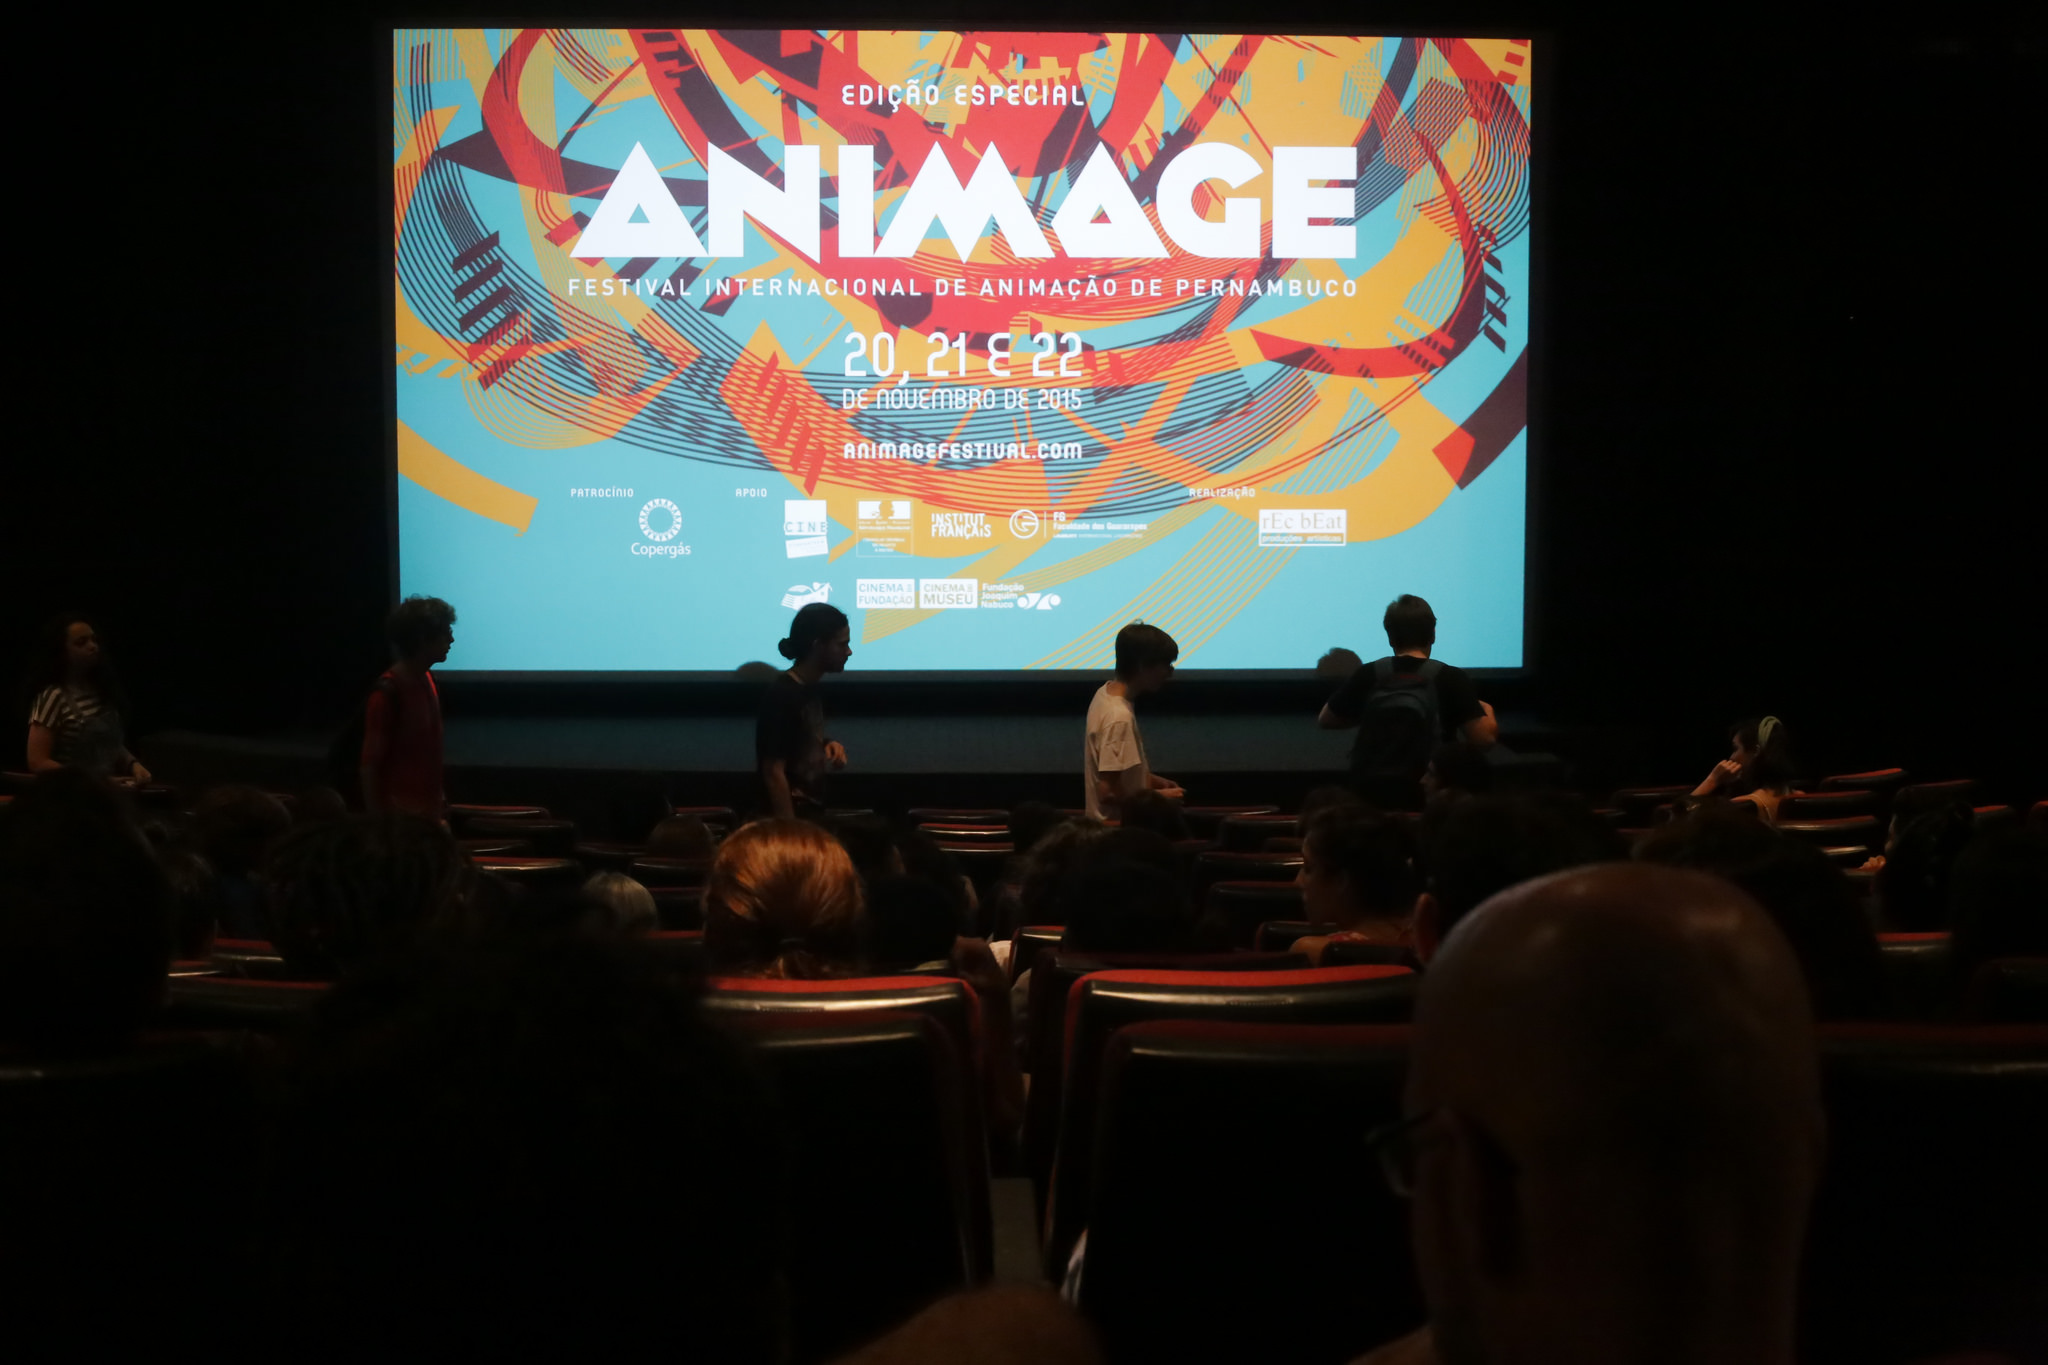 animage2016-01.jpg